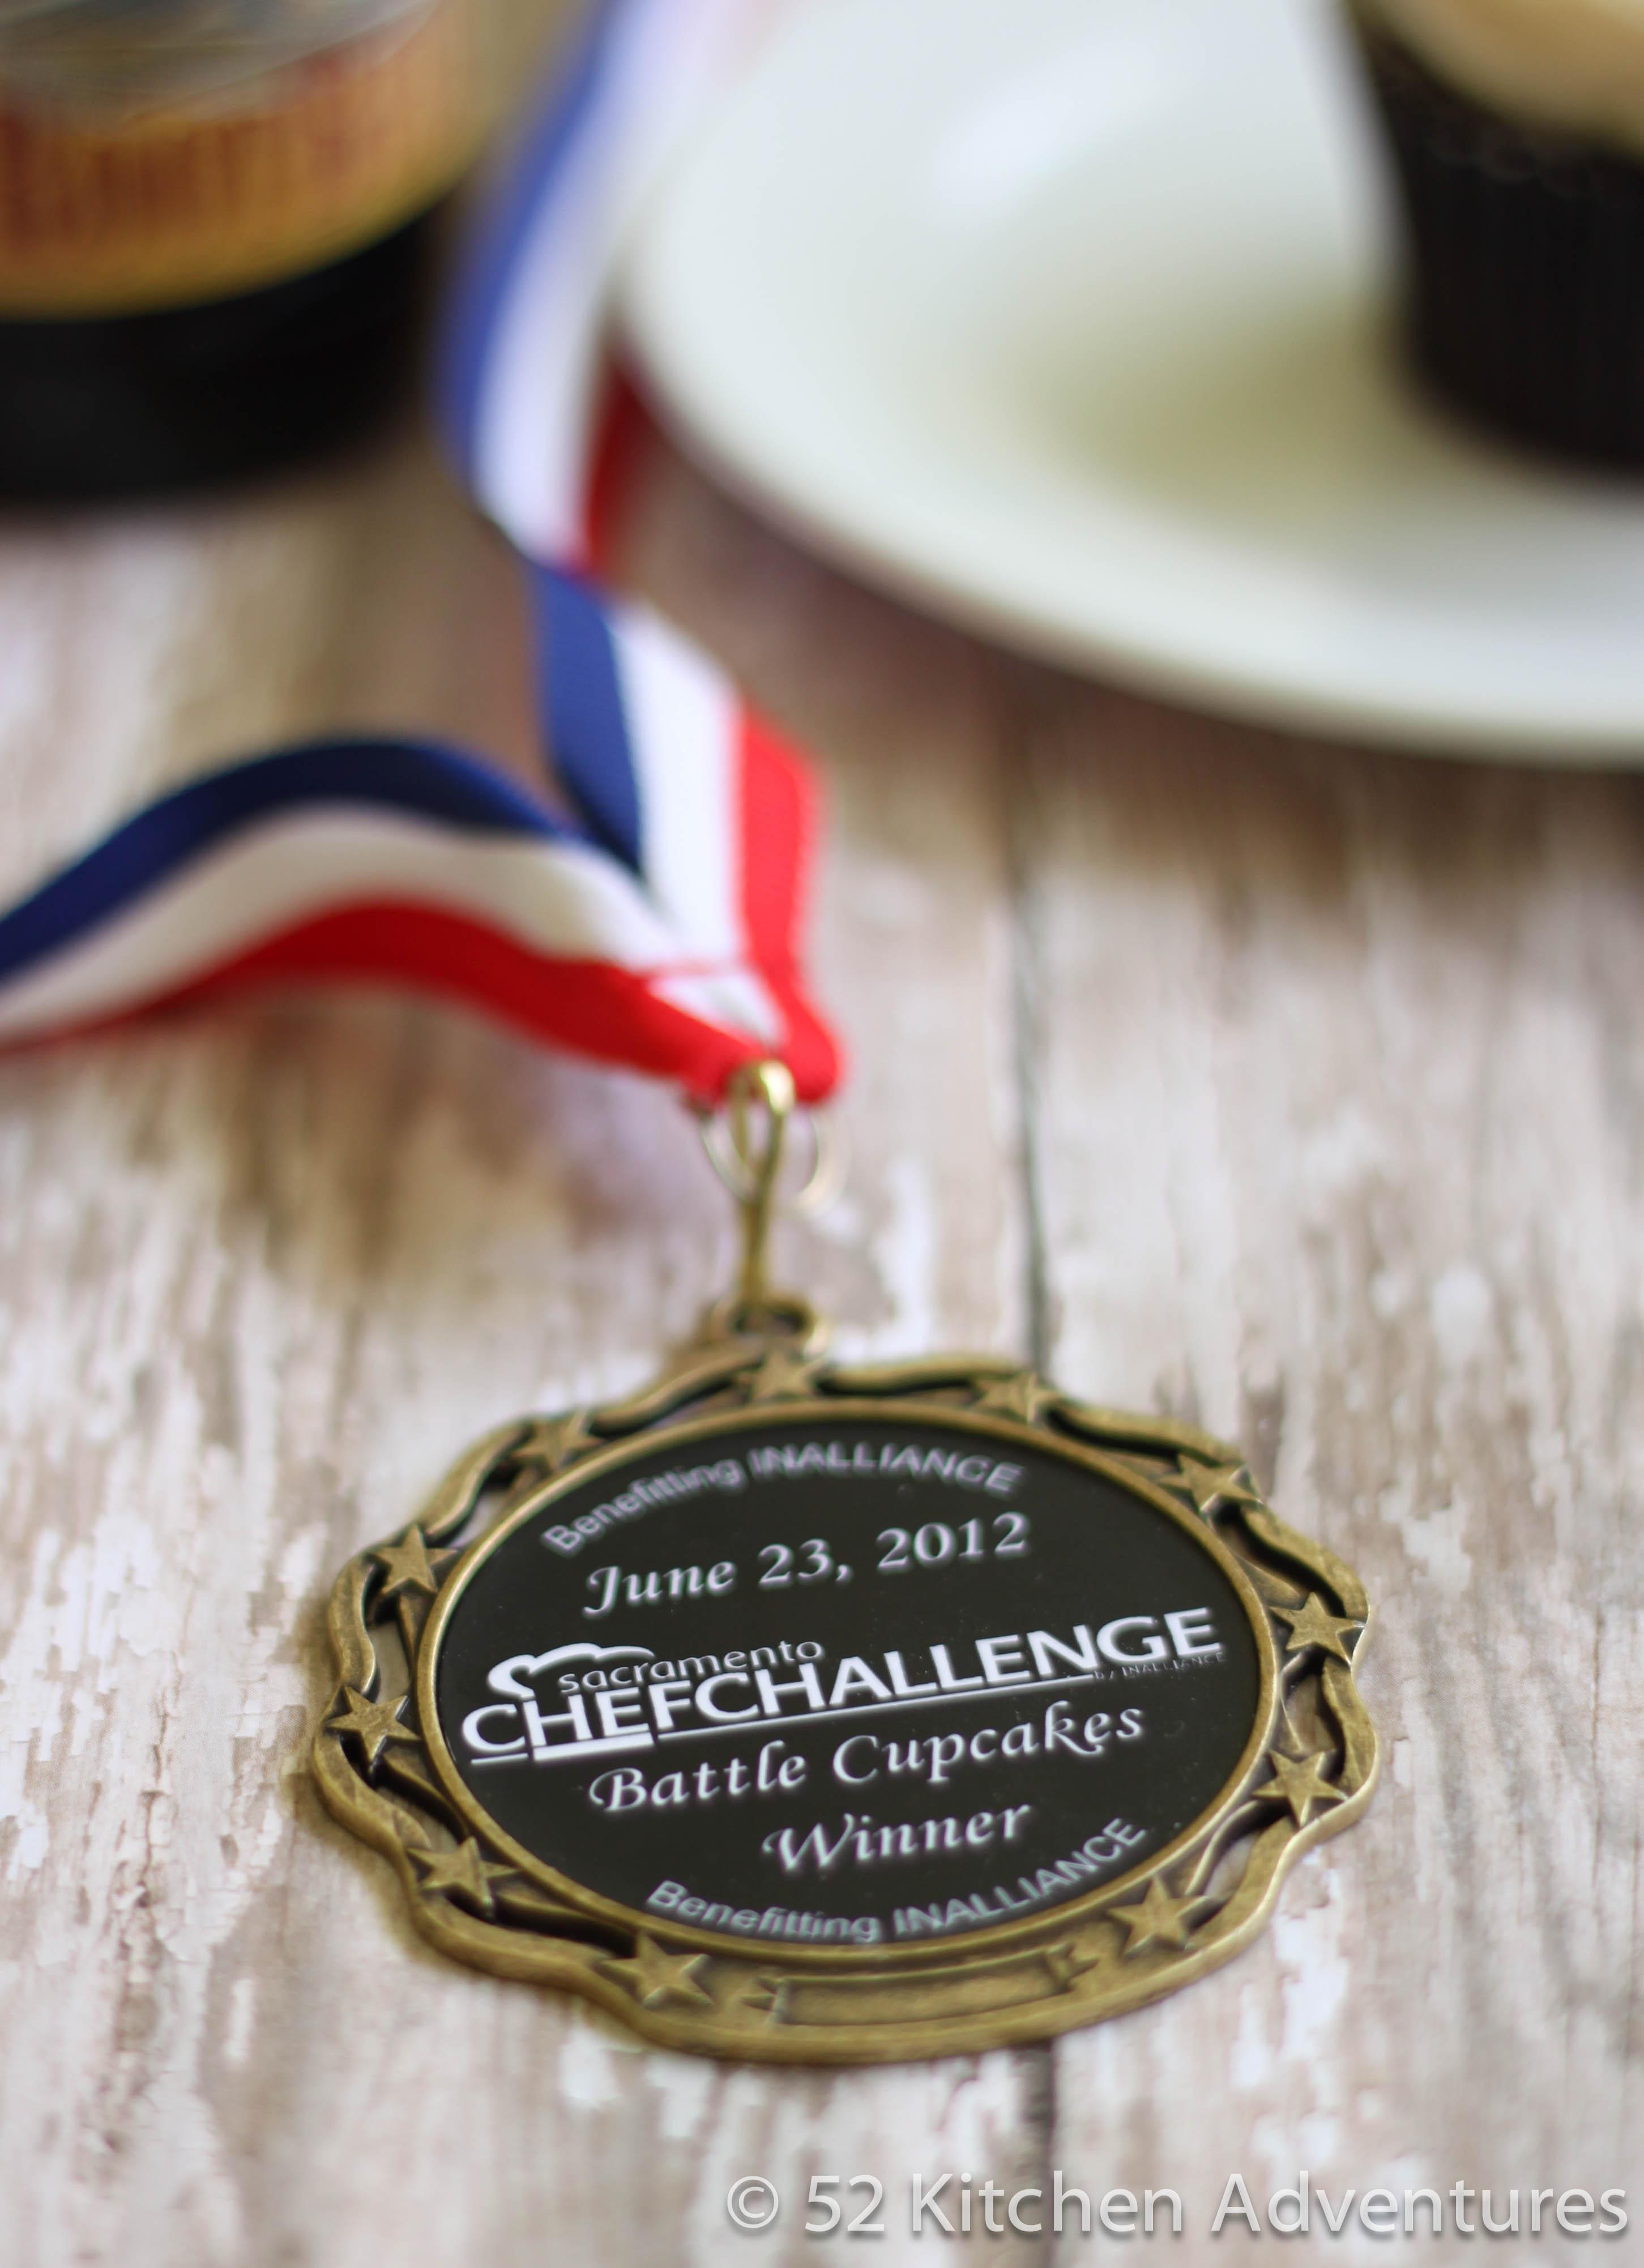 Battle Cupcake Gold Medal